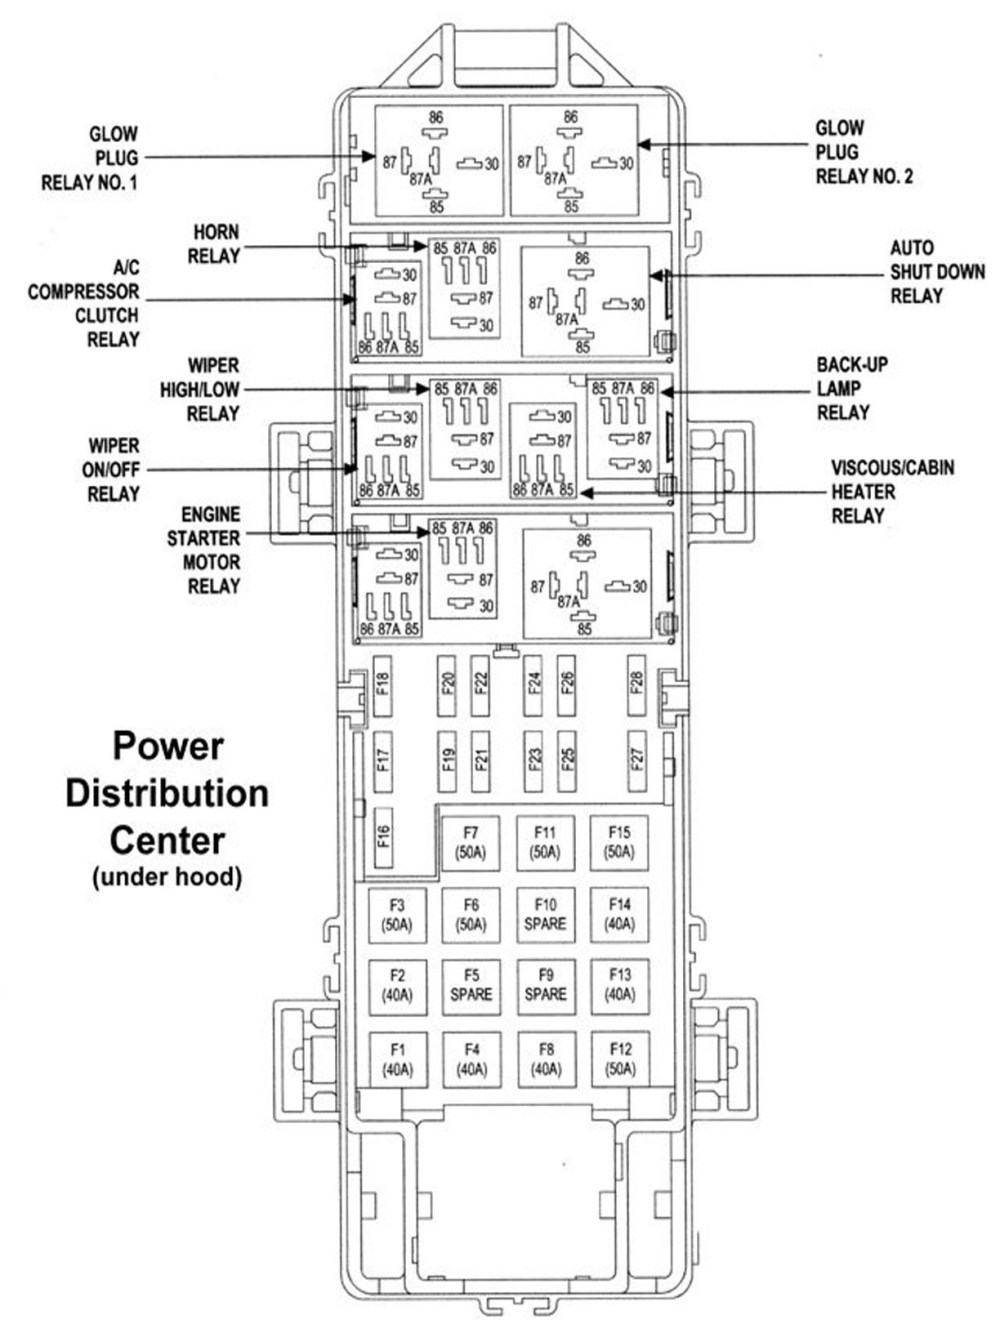 medium resolution of 2004 jeep grand cherokee blower motor wiring diagram best jeep grand 1999 jeep grand cherokee limited